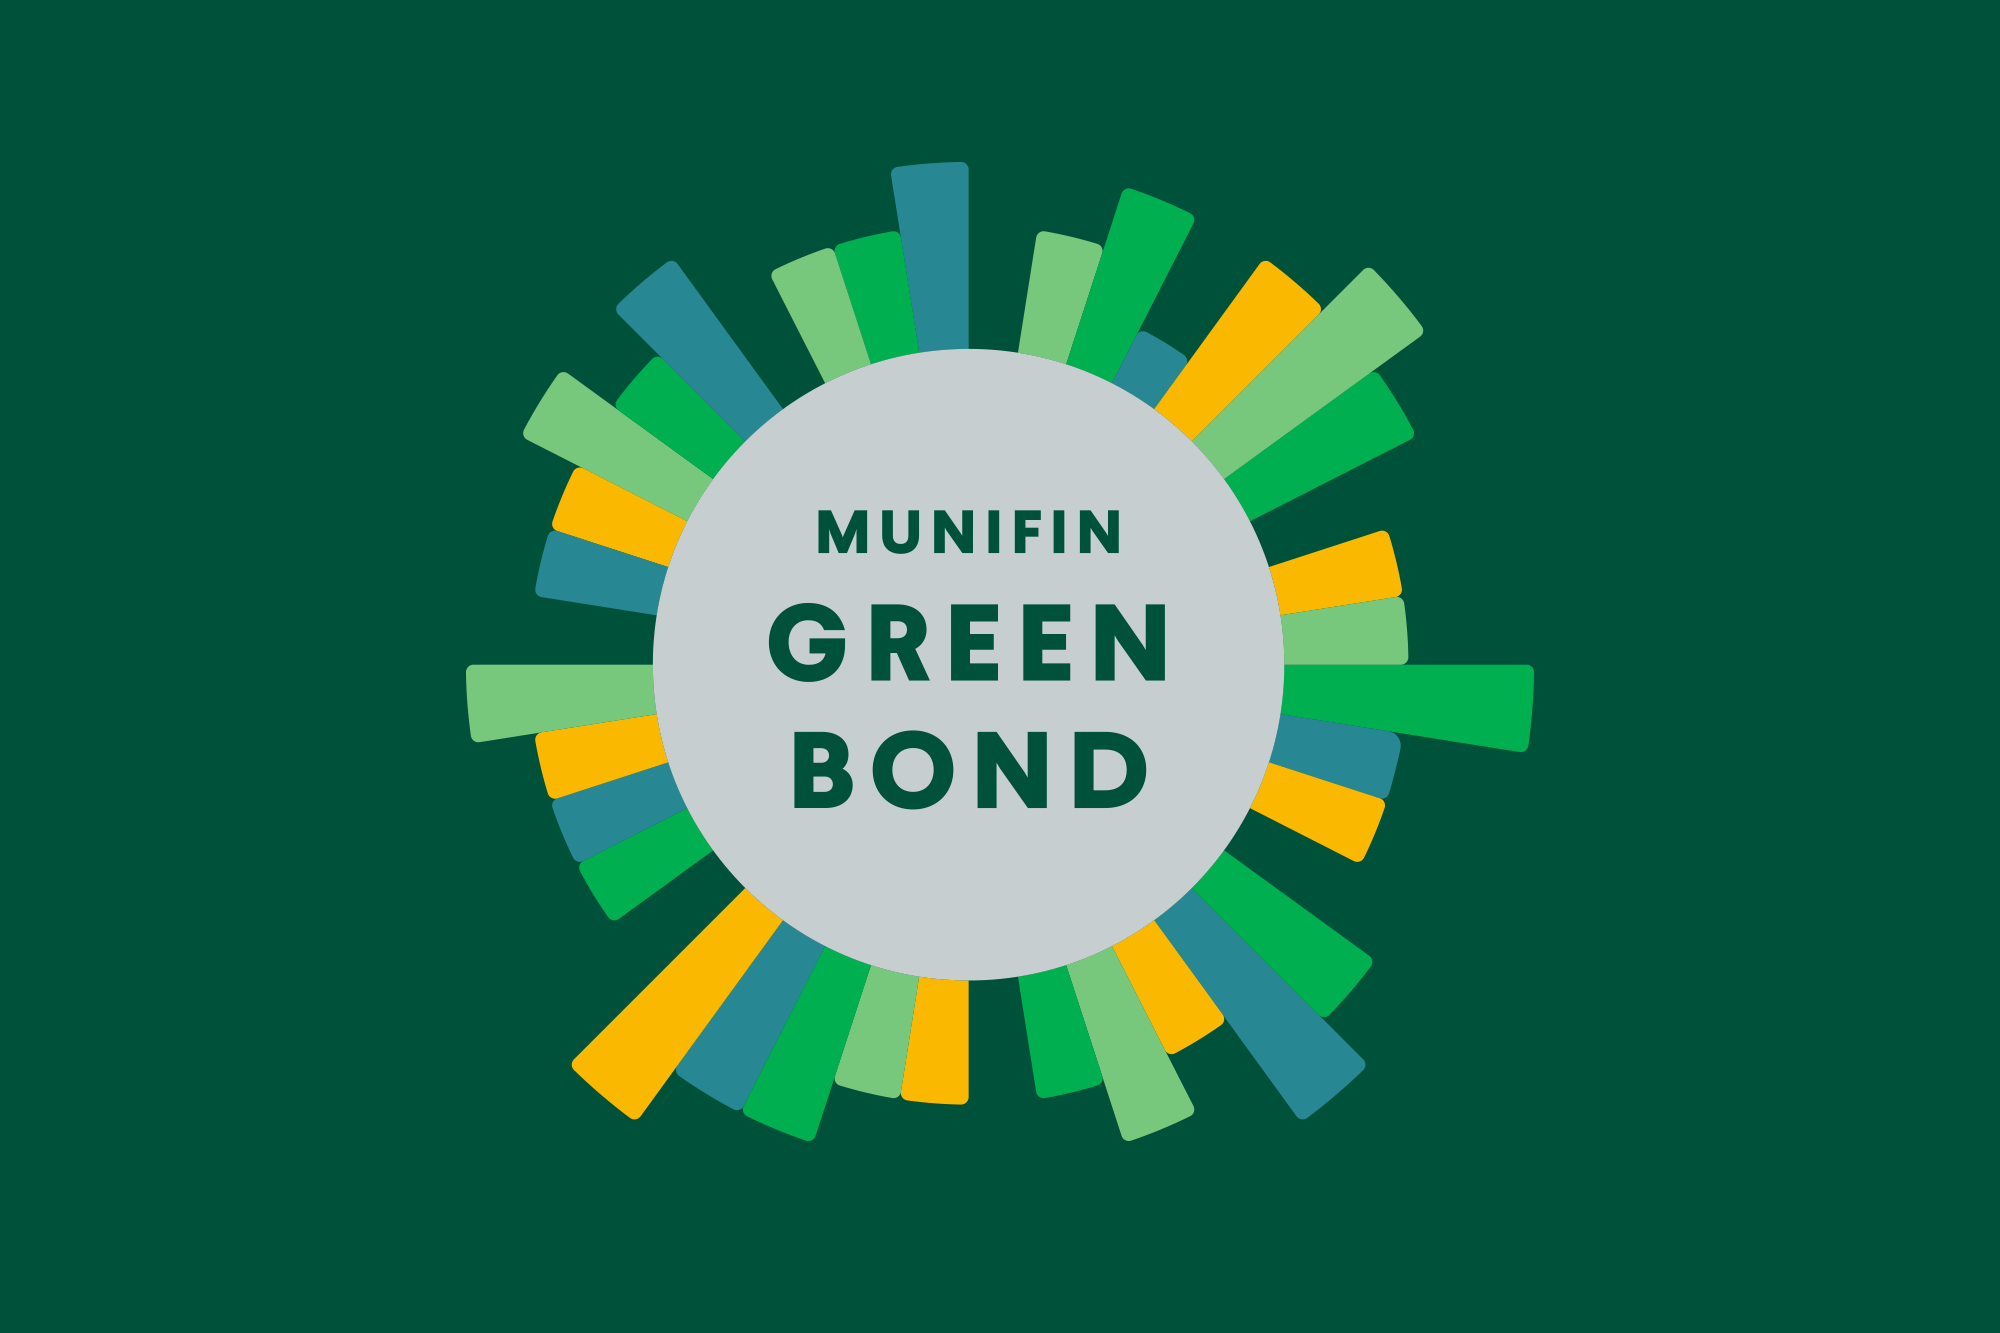 green-bond1.png